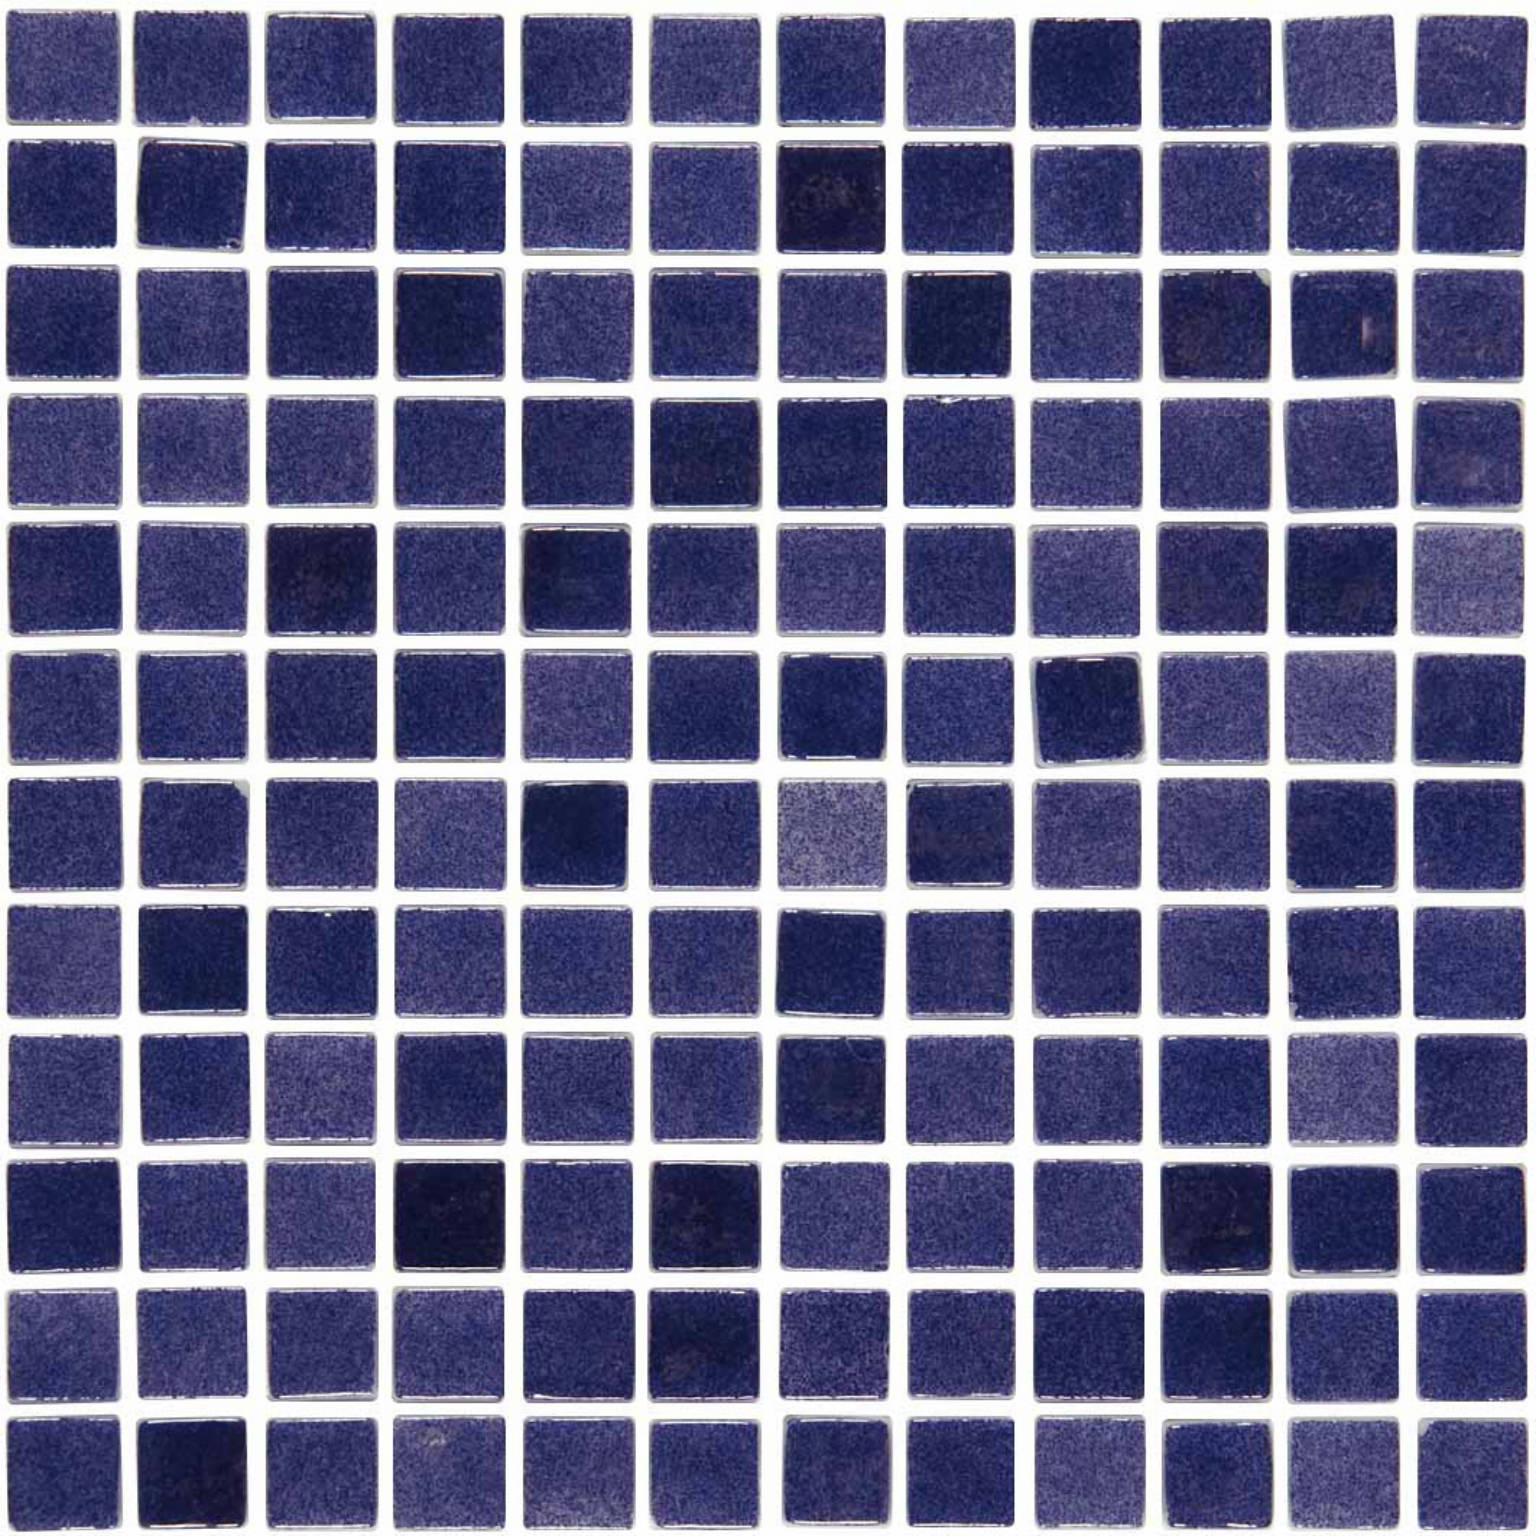 Br-2002 Azul Cobalto | Mosavit FR